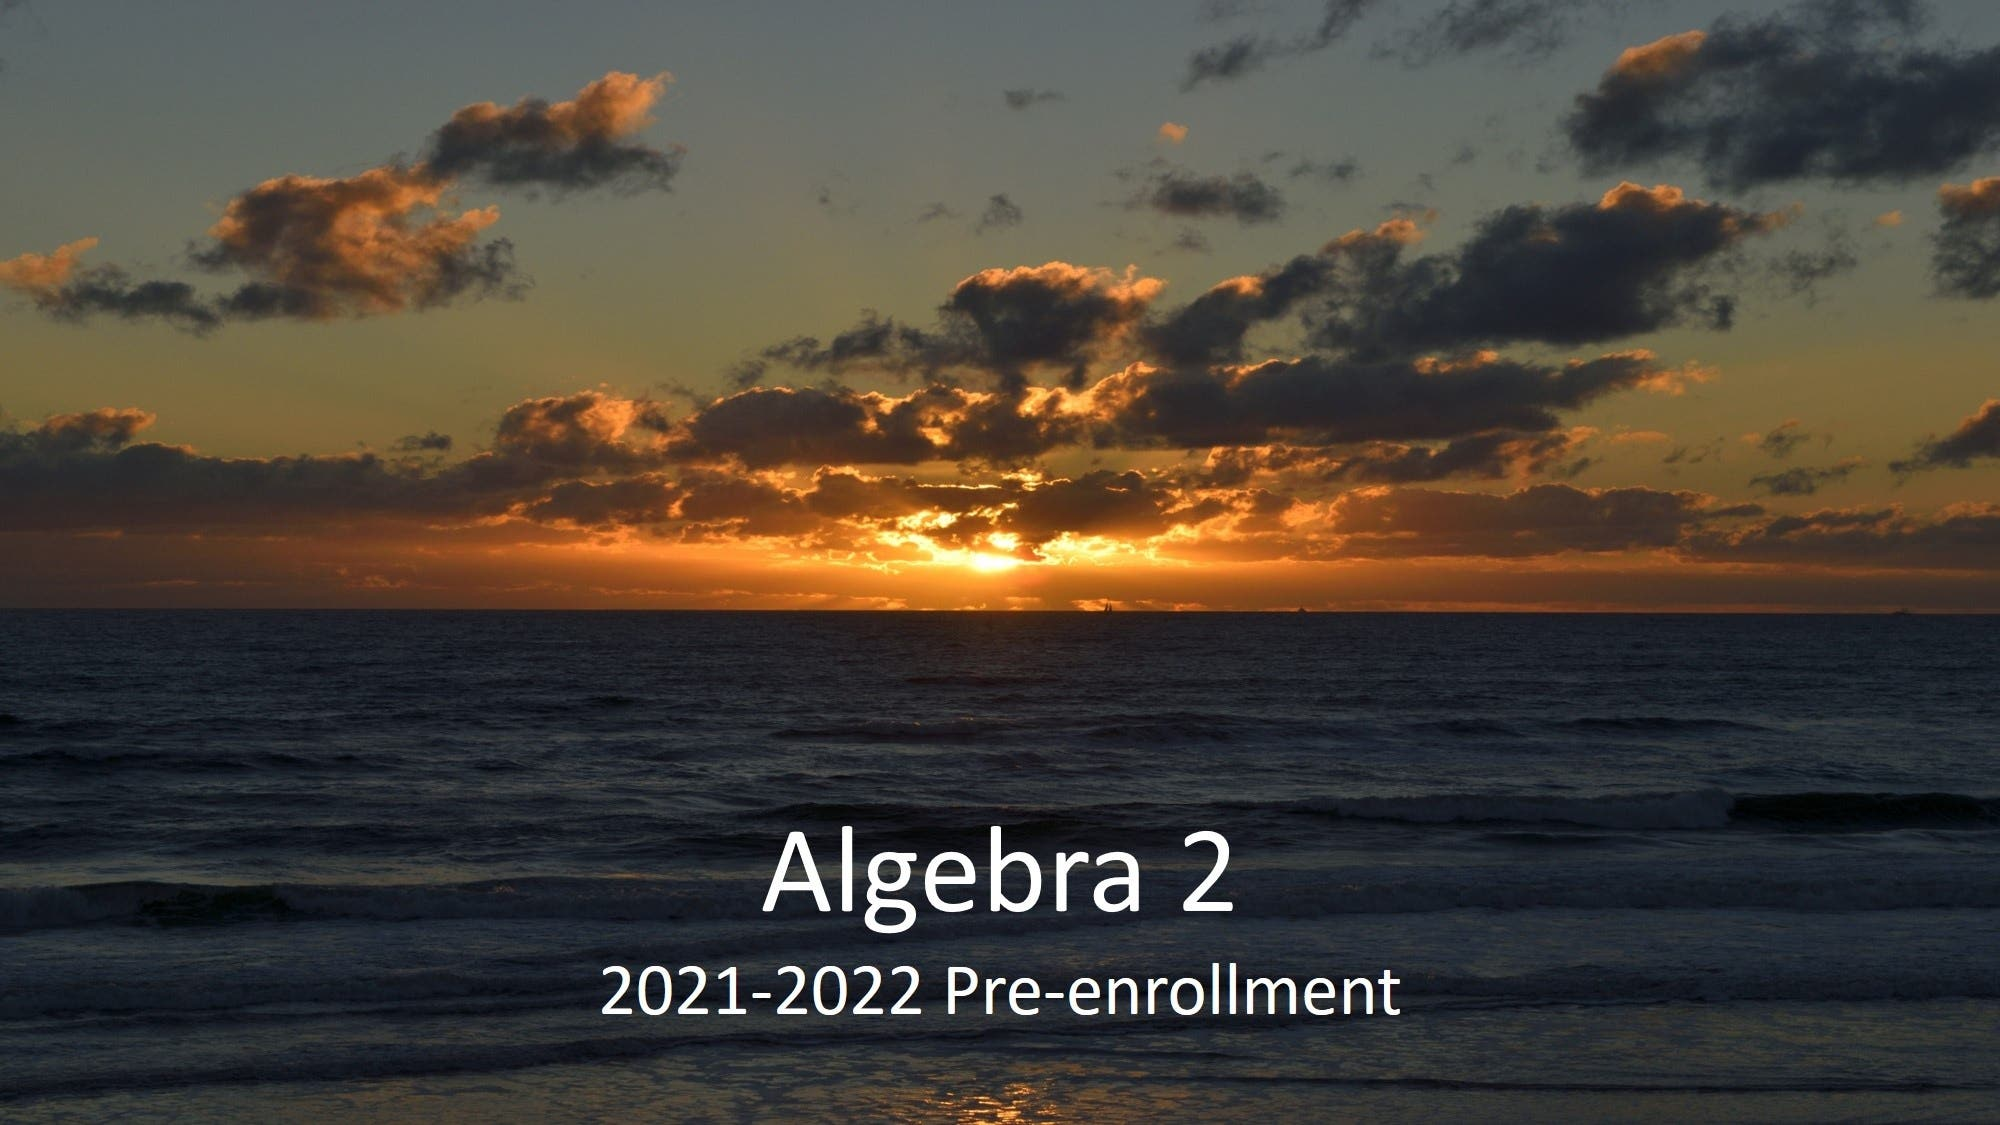 Algebra 2, Section 1: 2021-2022 Pre-enrollment